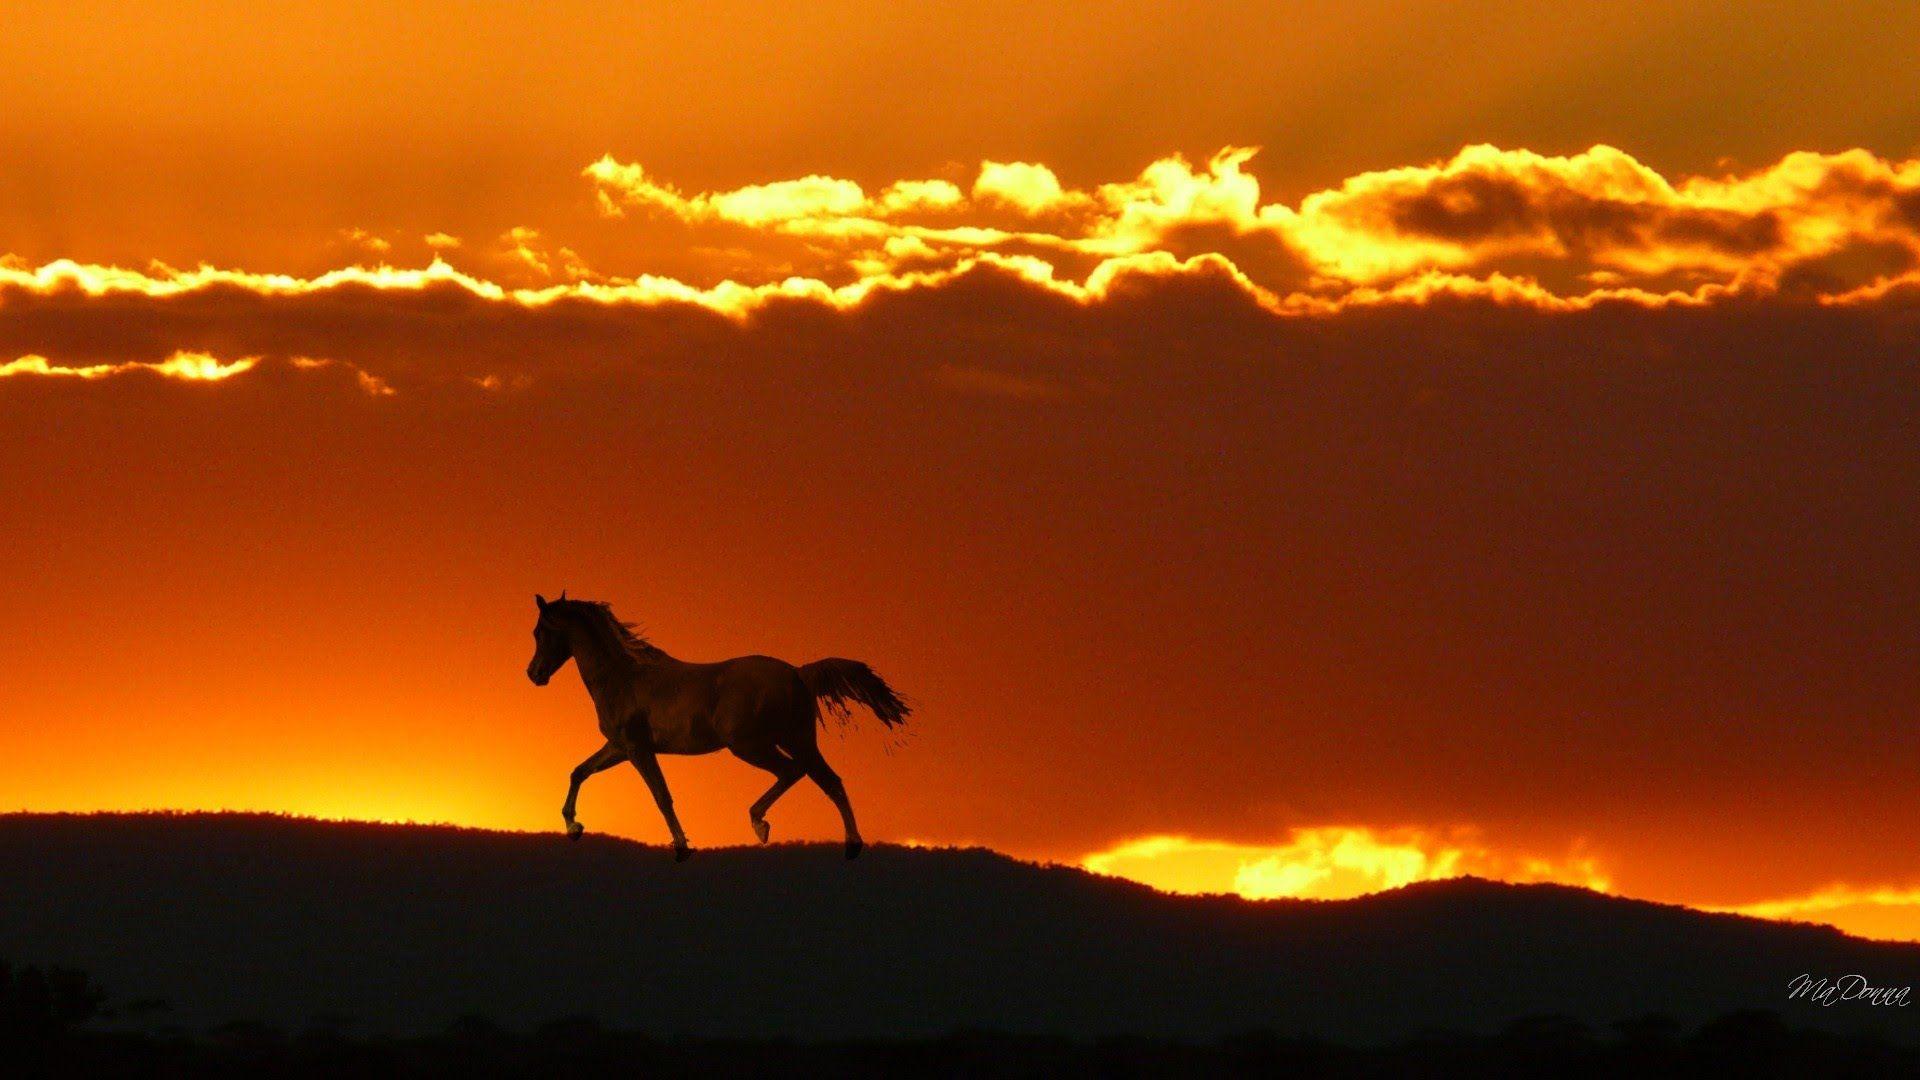 Horse In Horizon Pasture Hills Fire Sky Sunrise Sunset Clouds Desktop Bakcgrounds